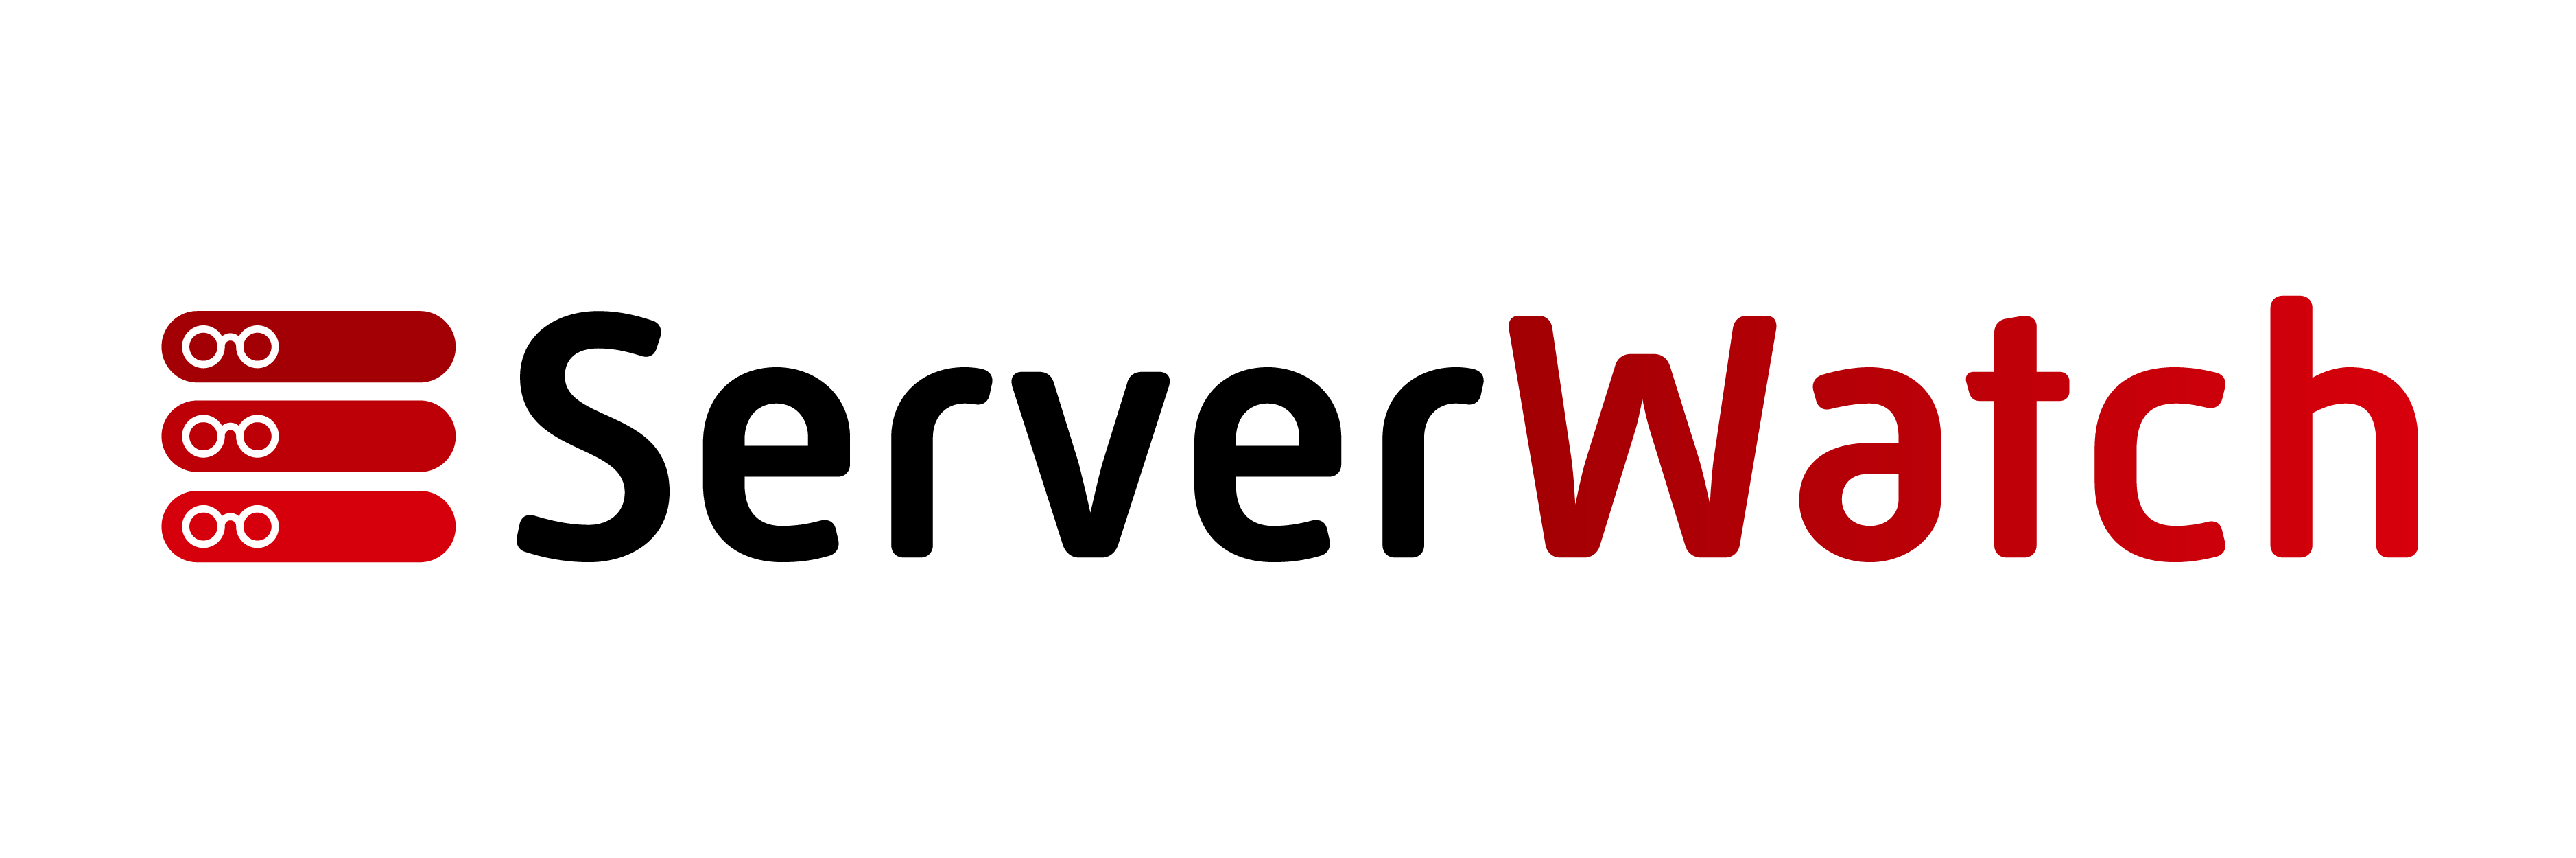 ServerWatch